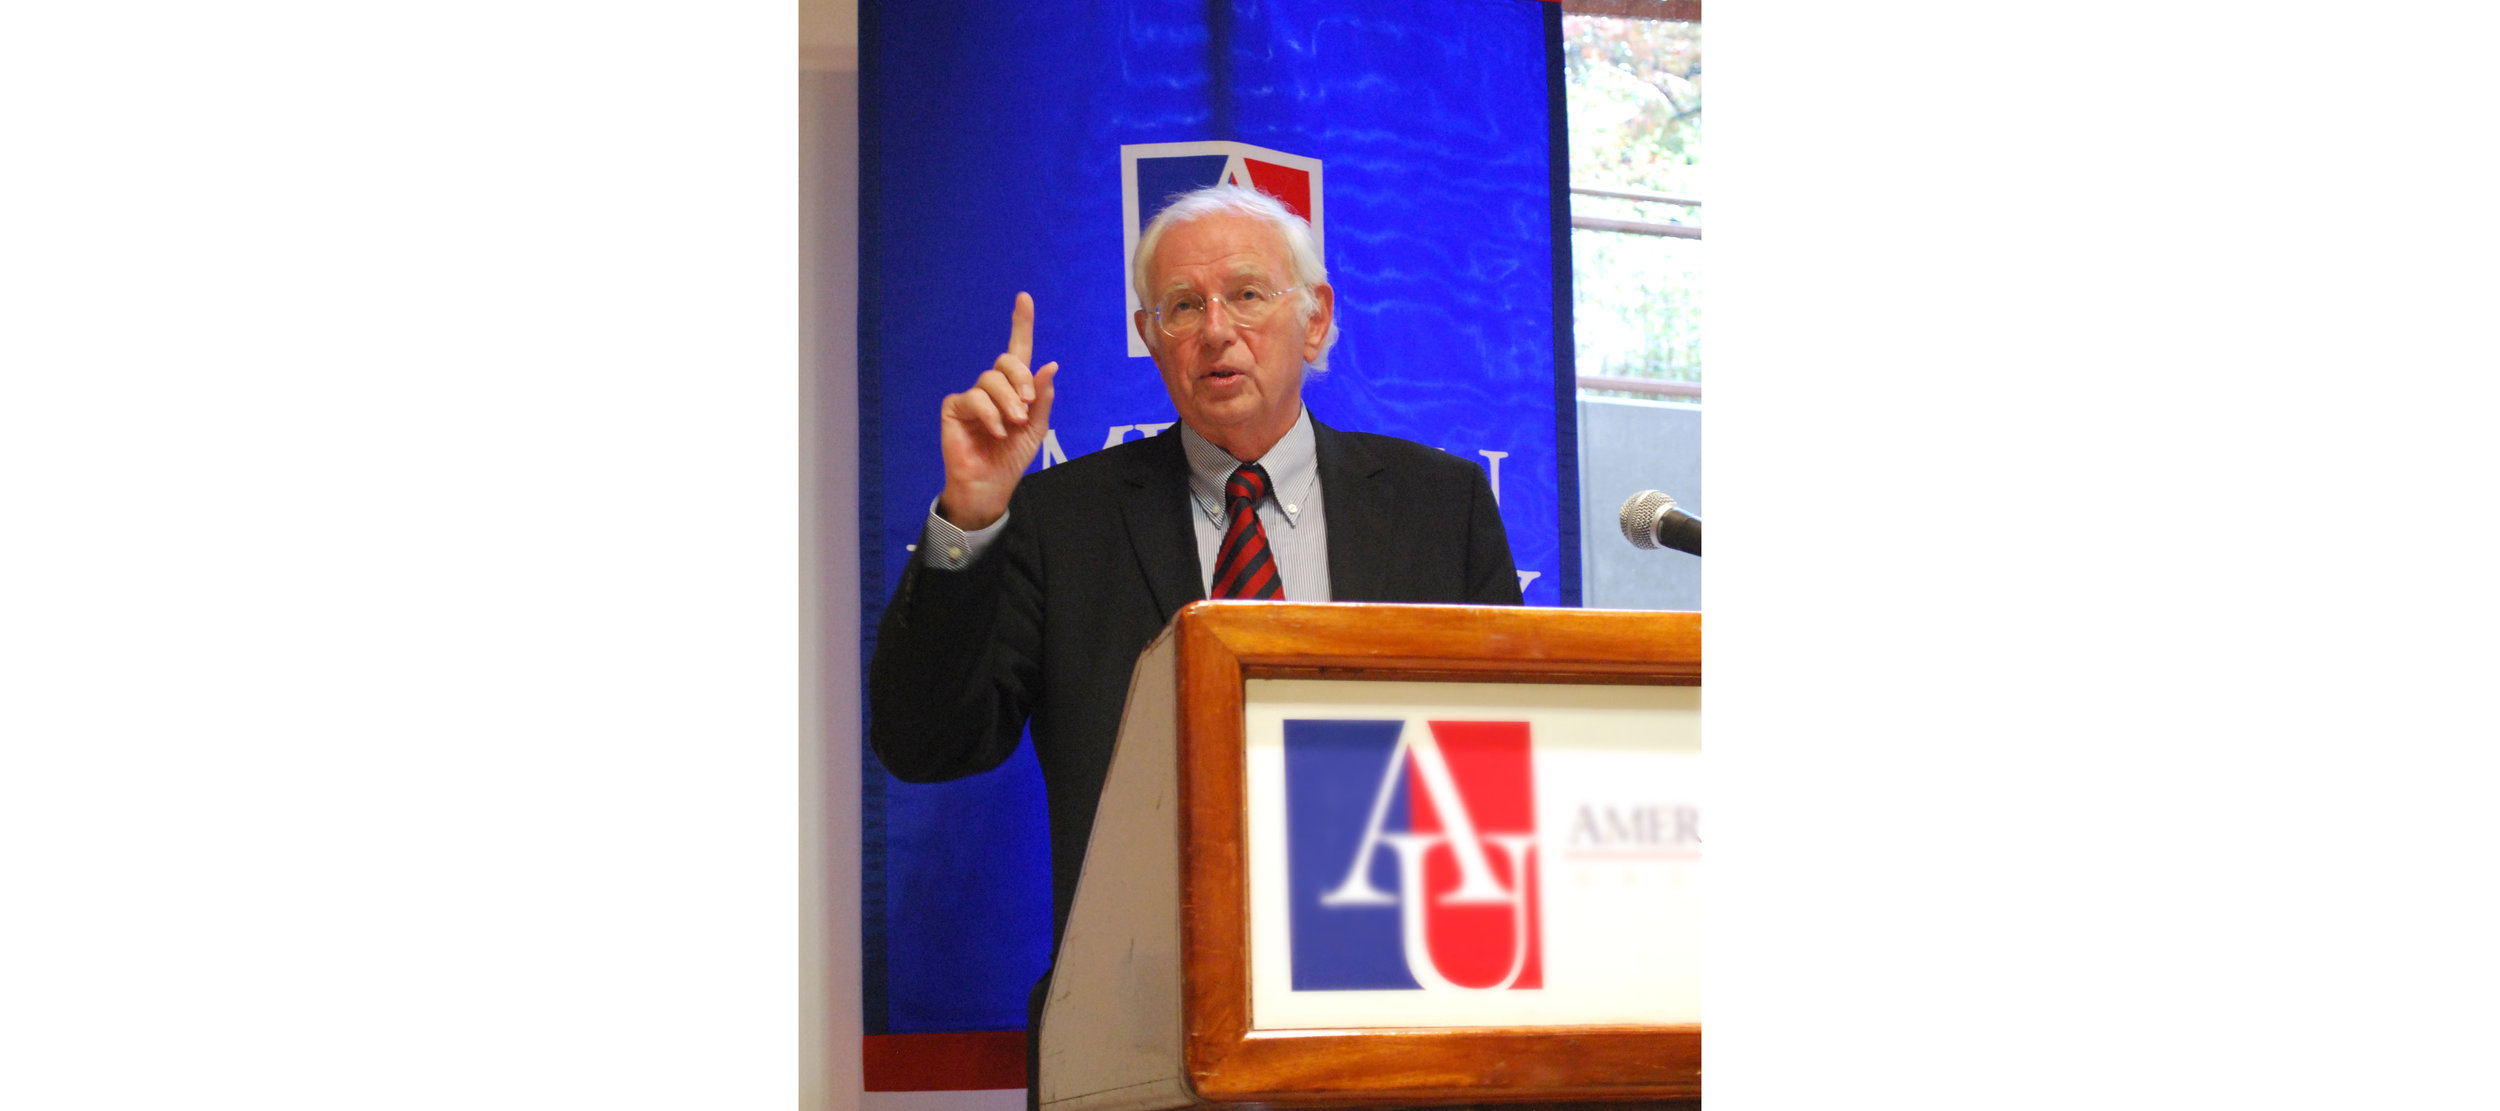 Diplomat & Former German Ambassador to the U.S. Dr. Klaus Scharioth